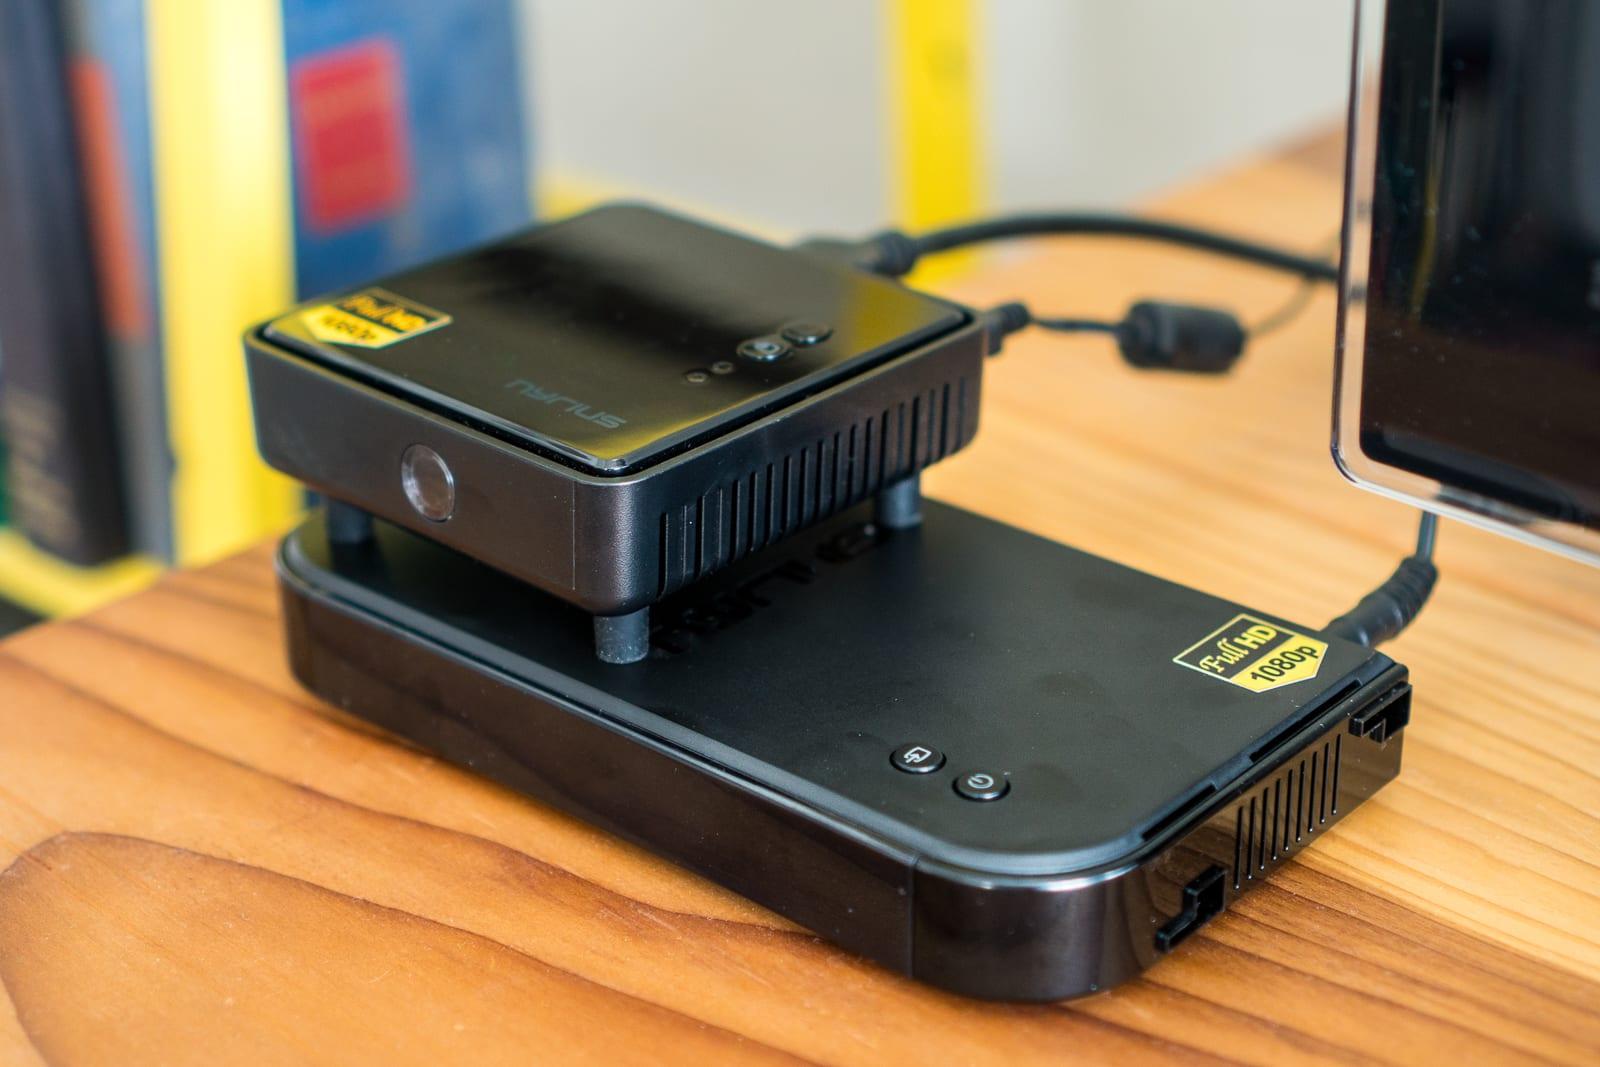 Wireless HDMI video transmitter